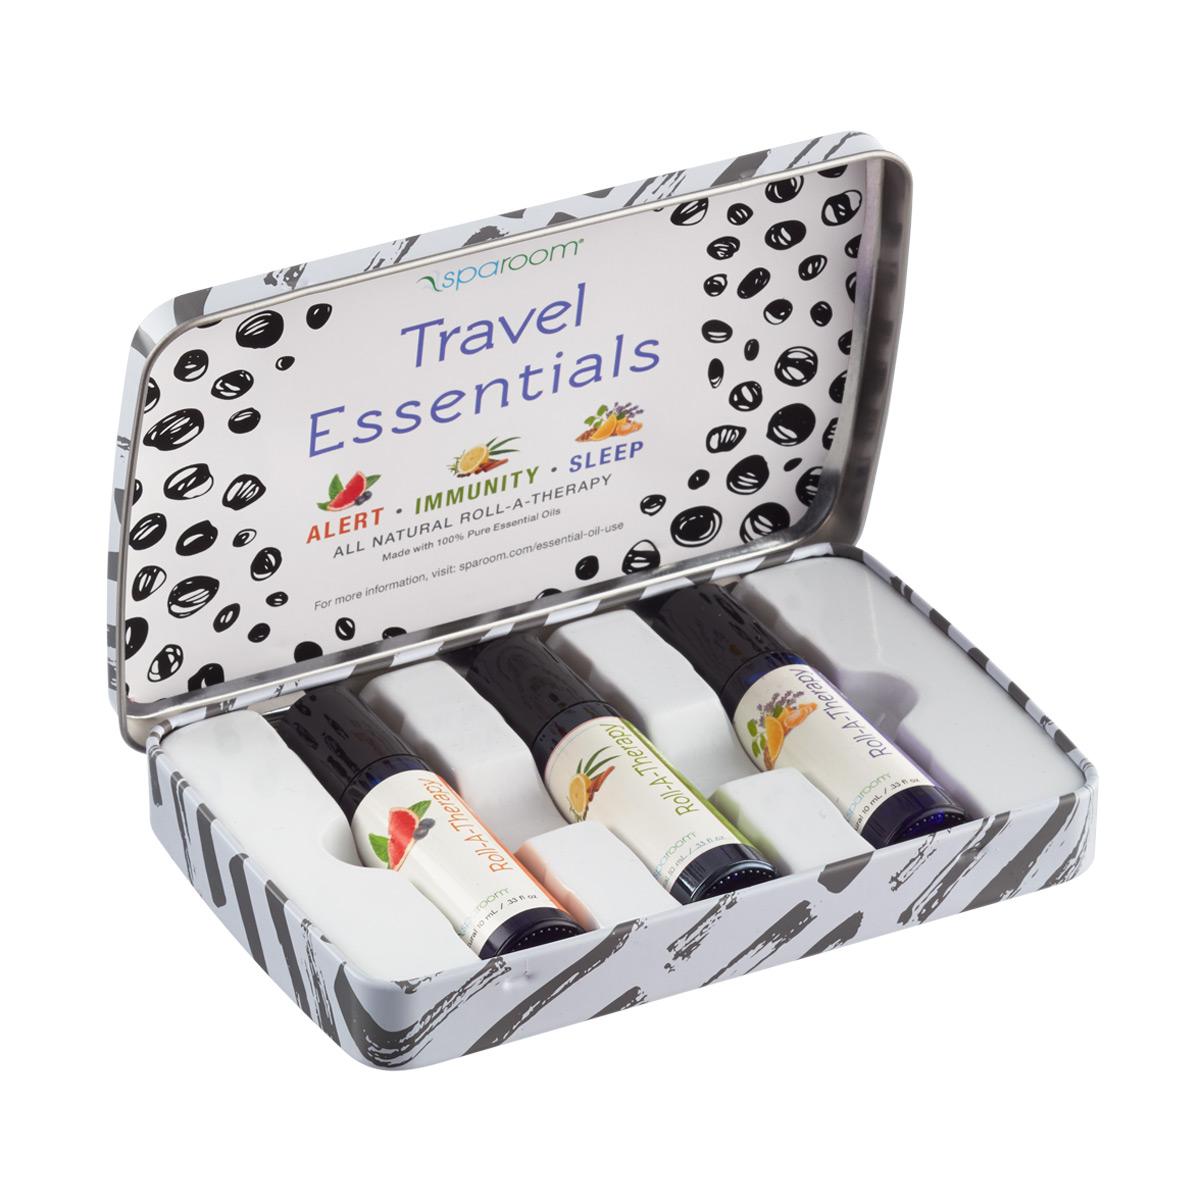 Travel Essential Oil Kit